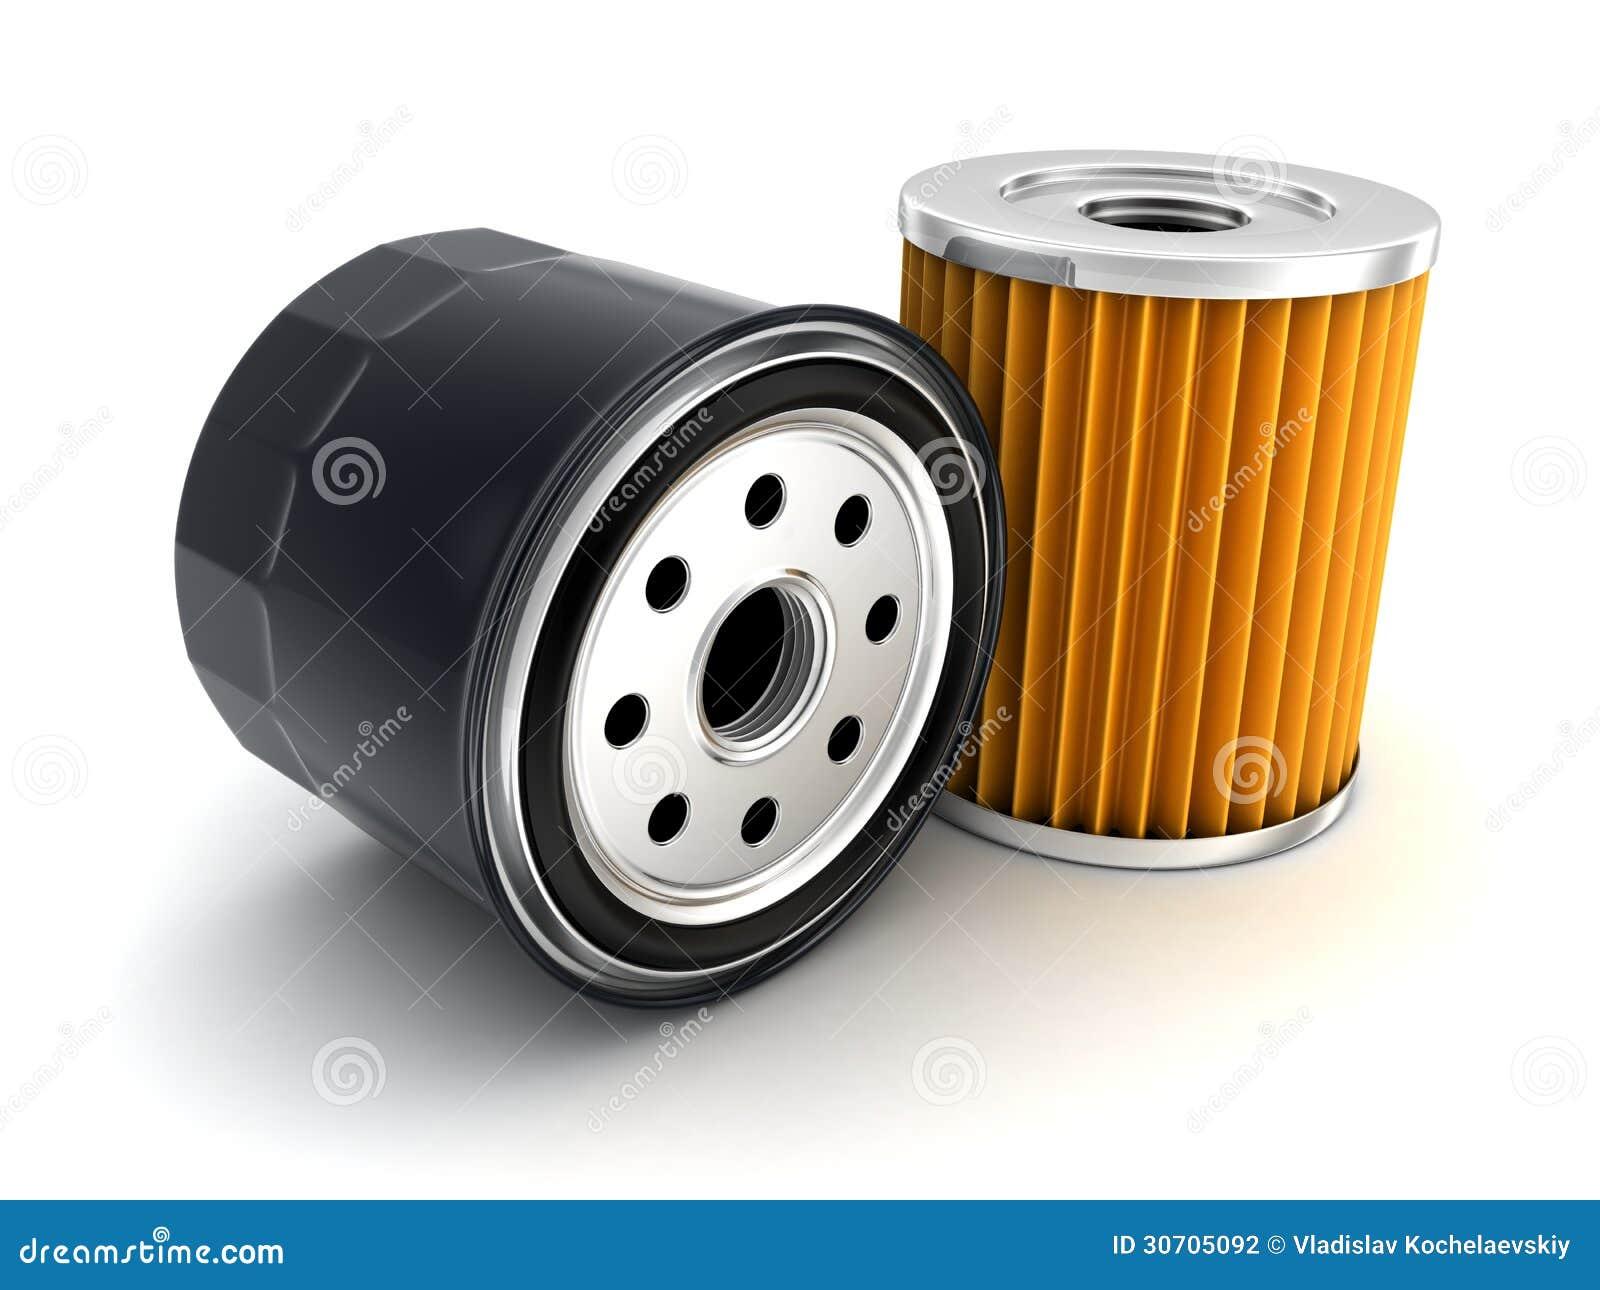 filtre huile de voiture photographie stock image 30705092. Black Bedroom Furniture Sets. Home Design Ideas